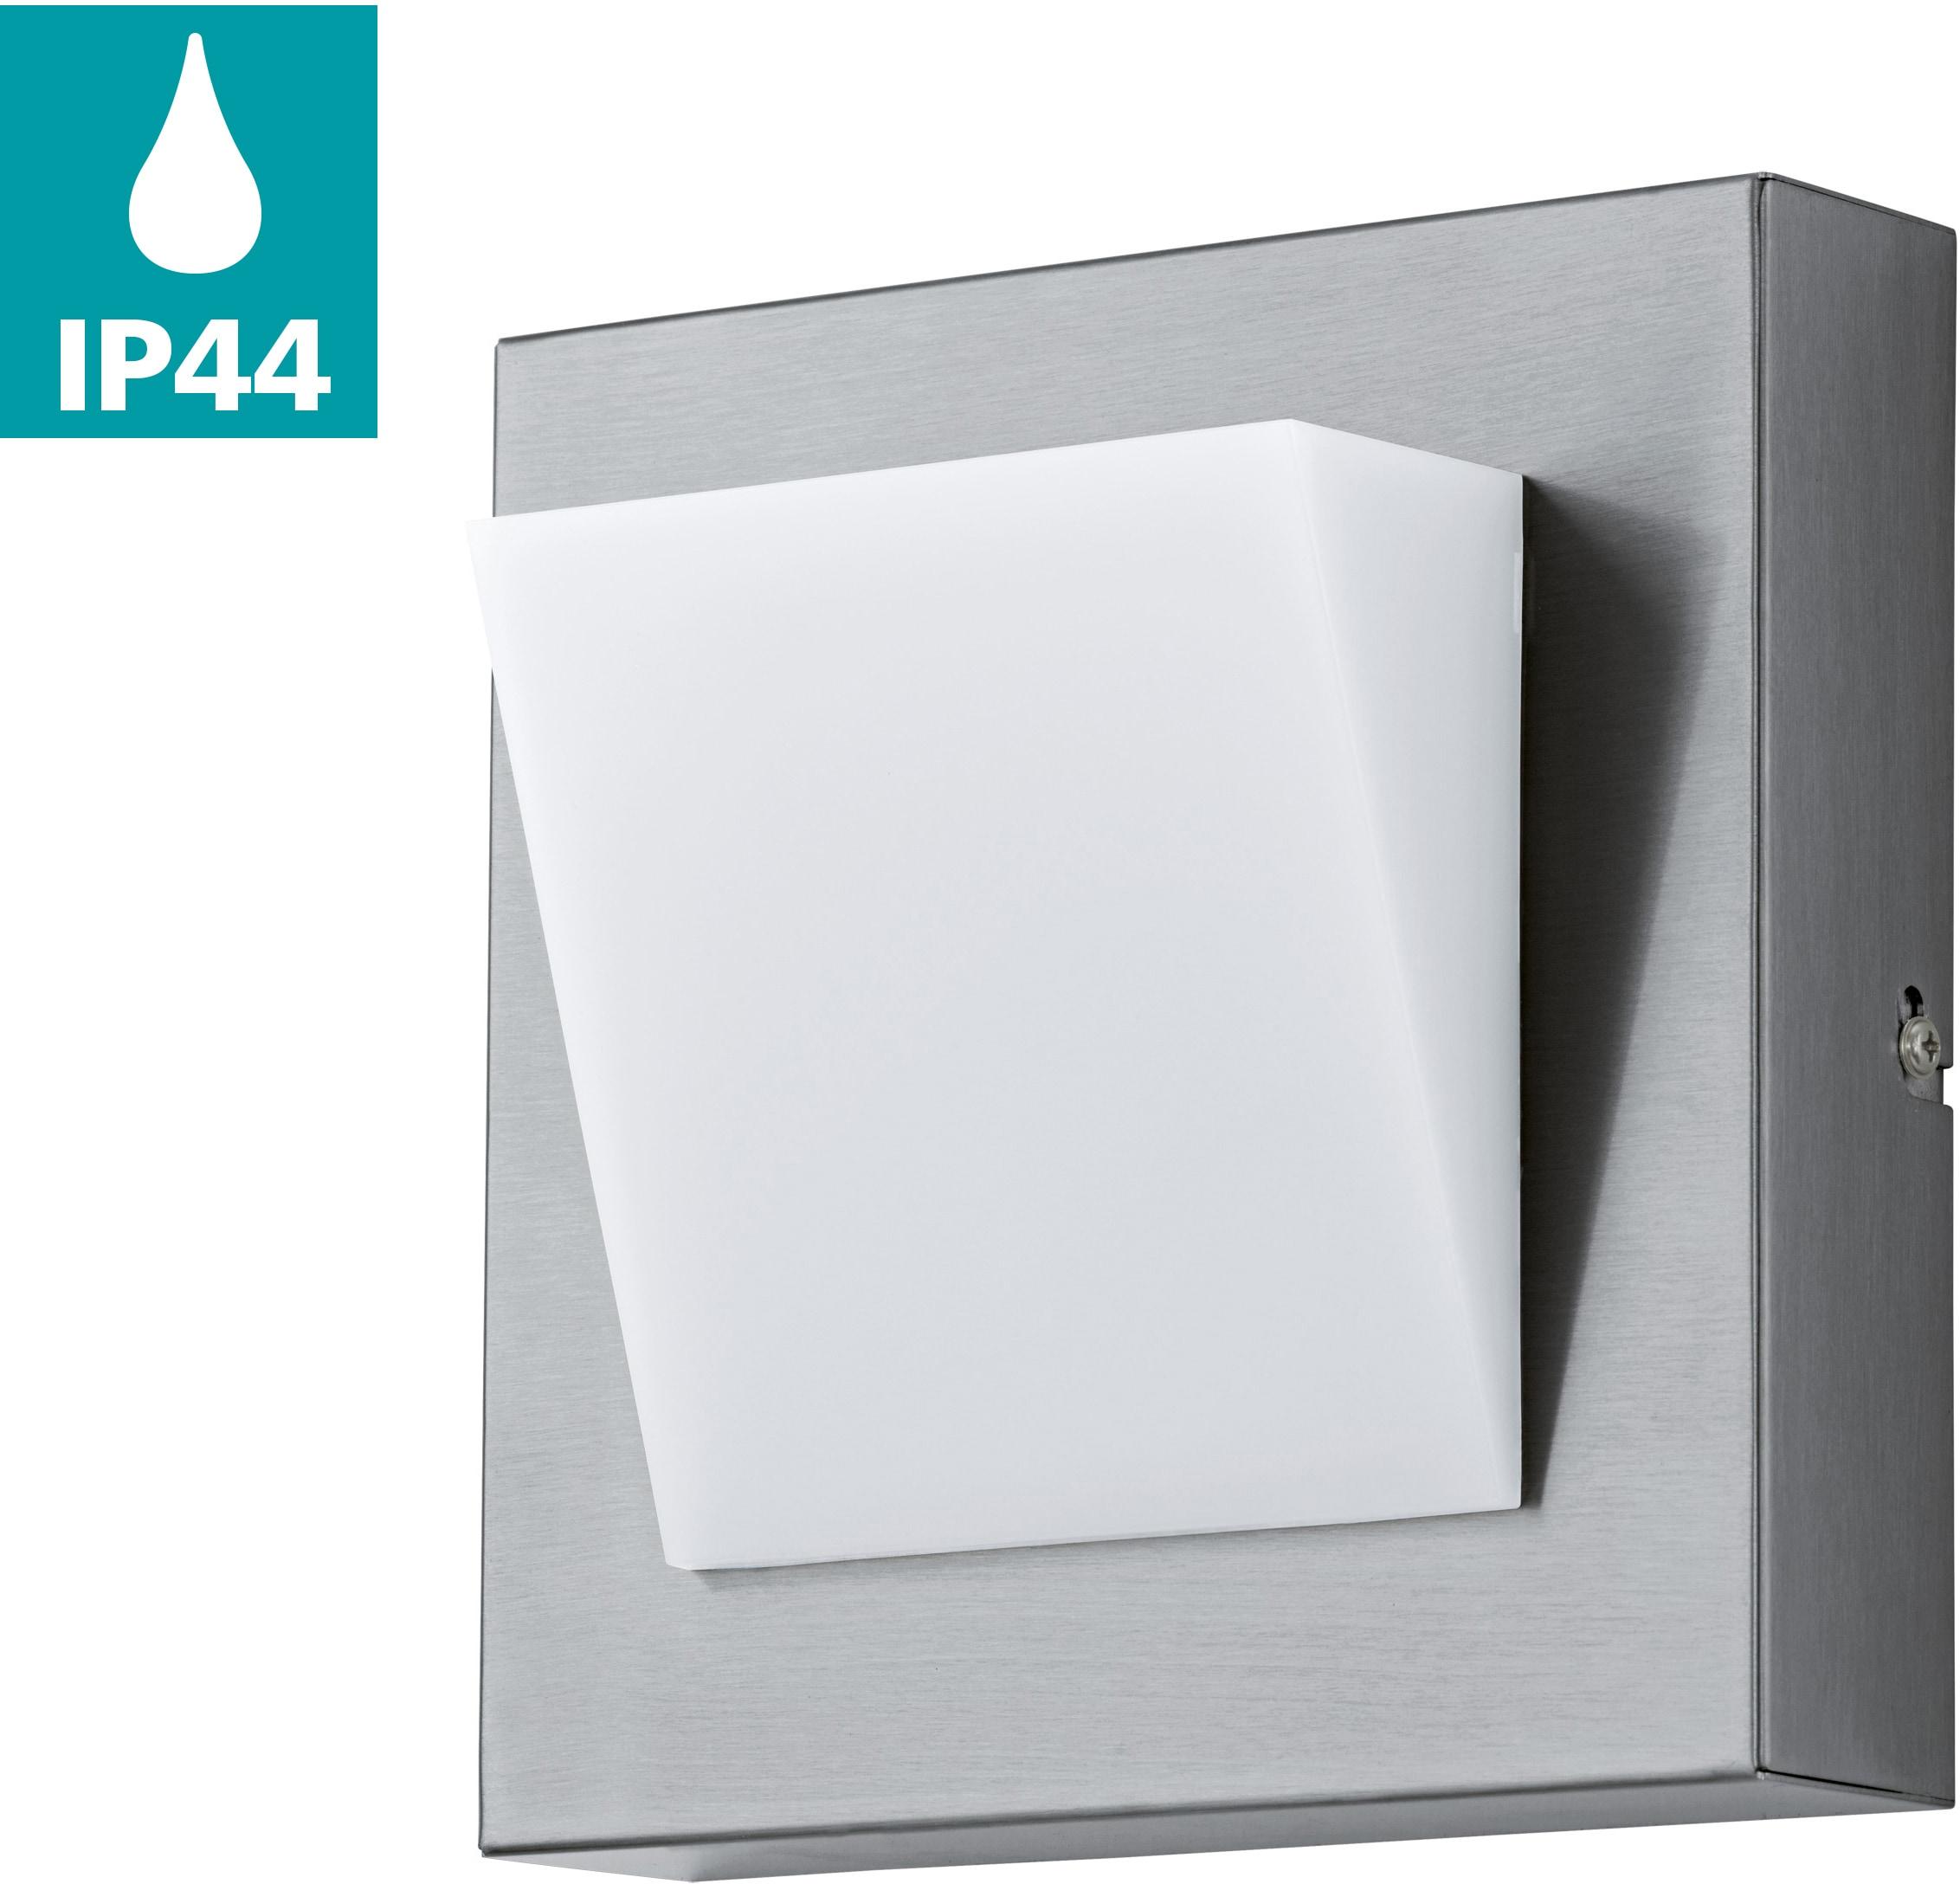 EGLO LED Außen-Wandleuchte CALGARY1, LED-Board, Warmweiß, LED tauschbar